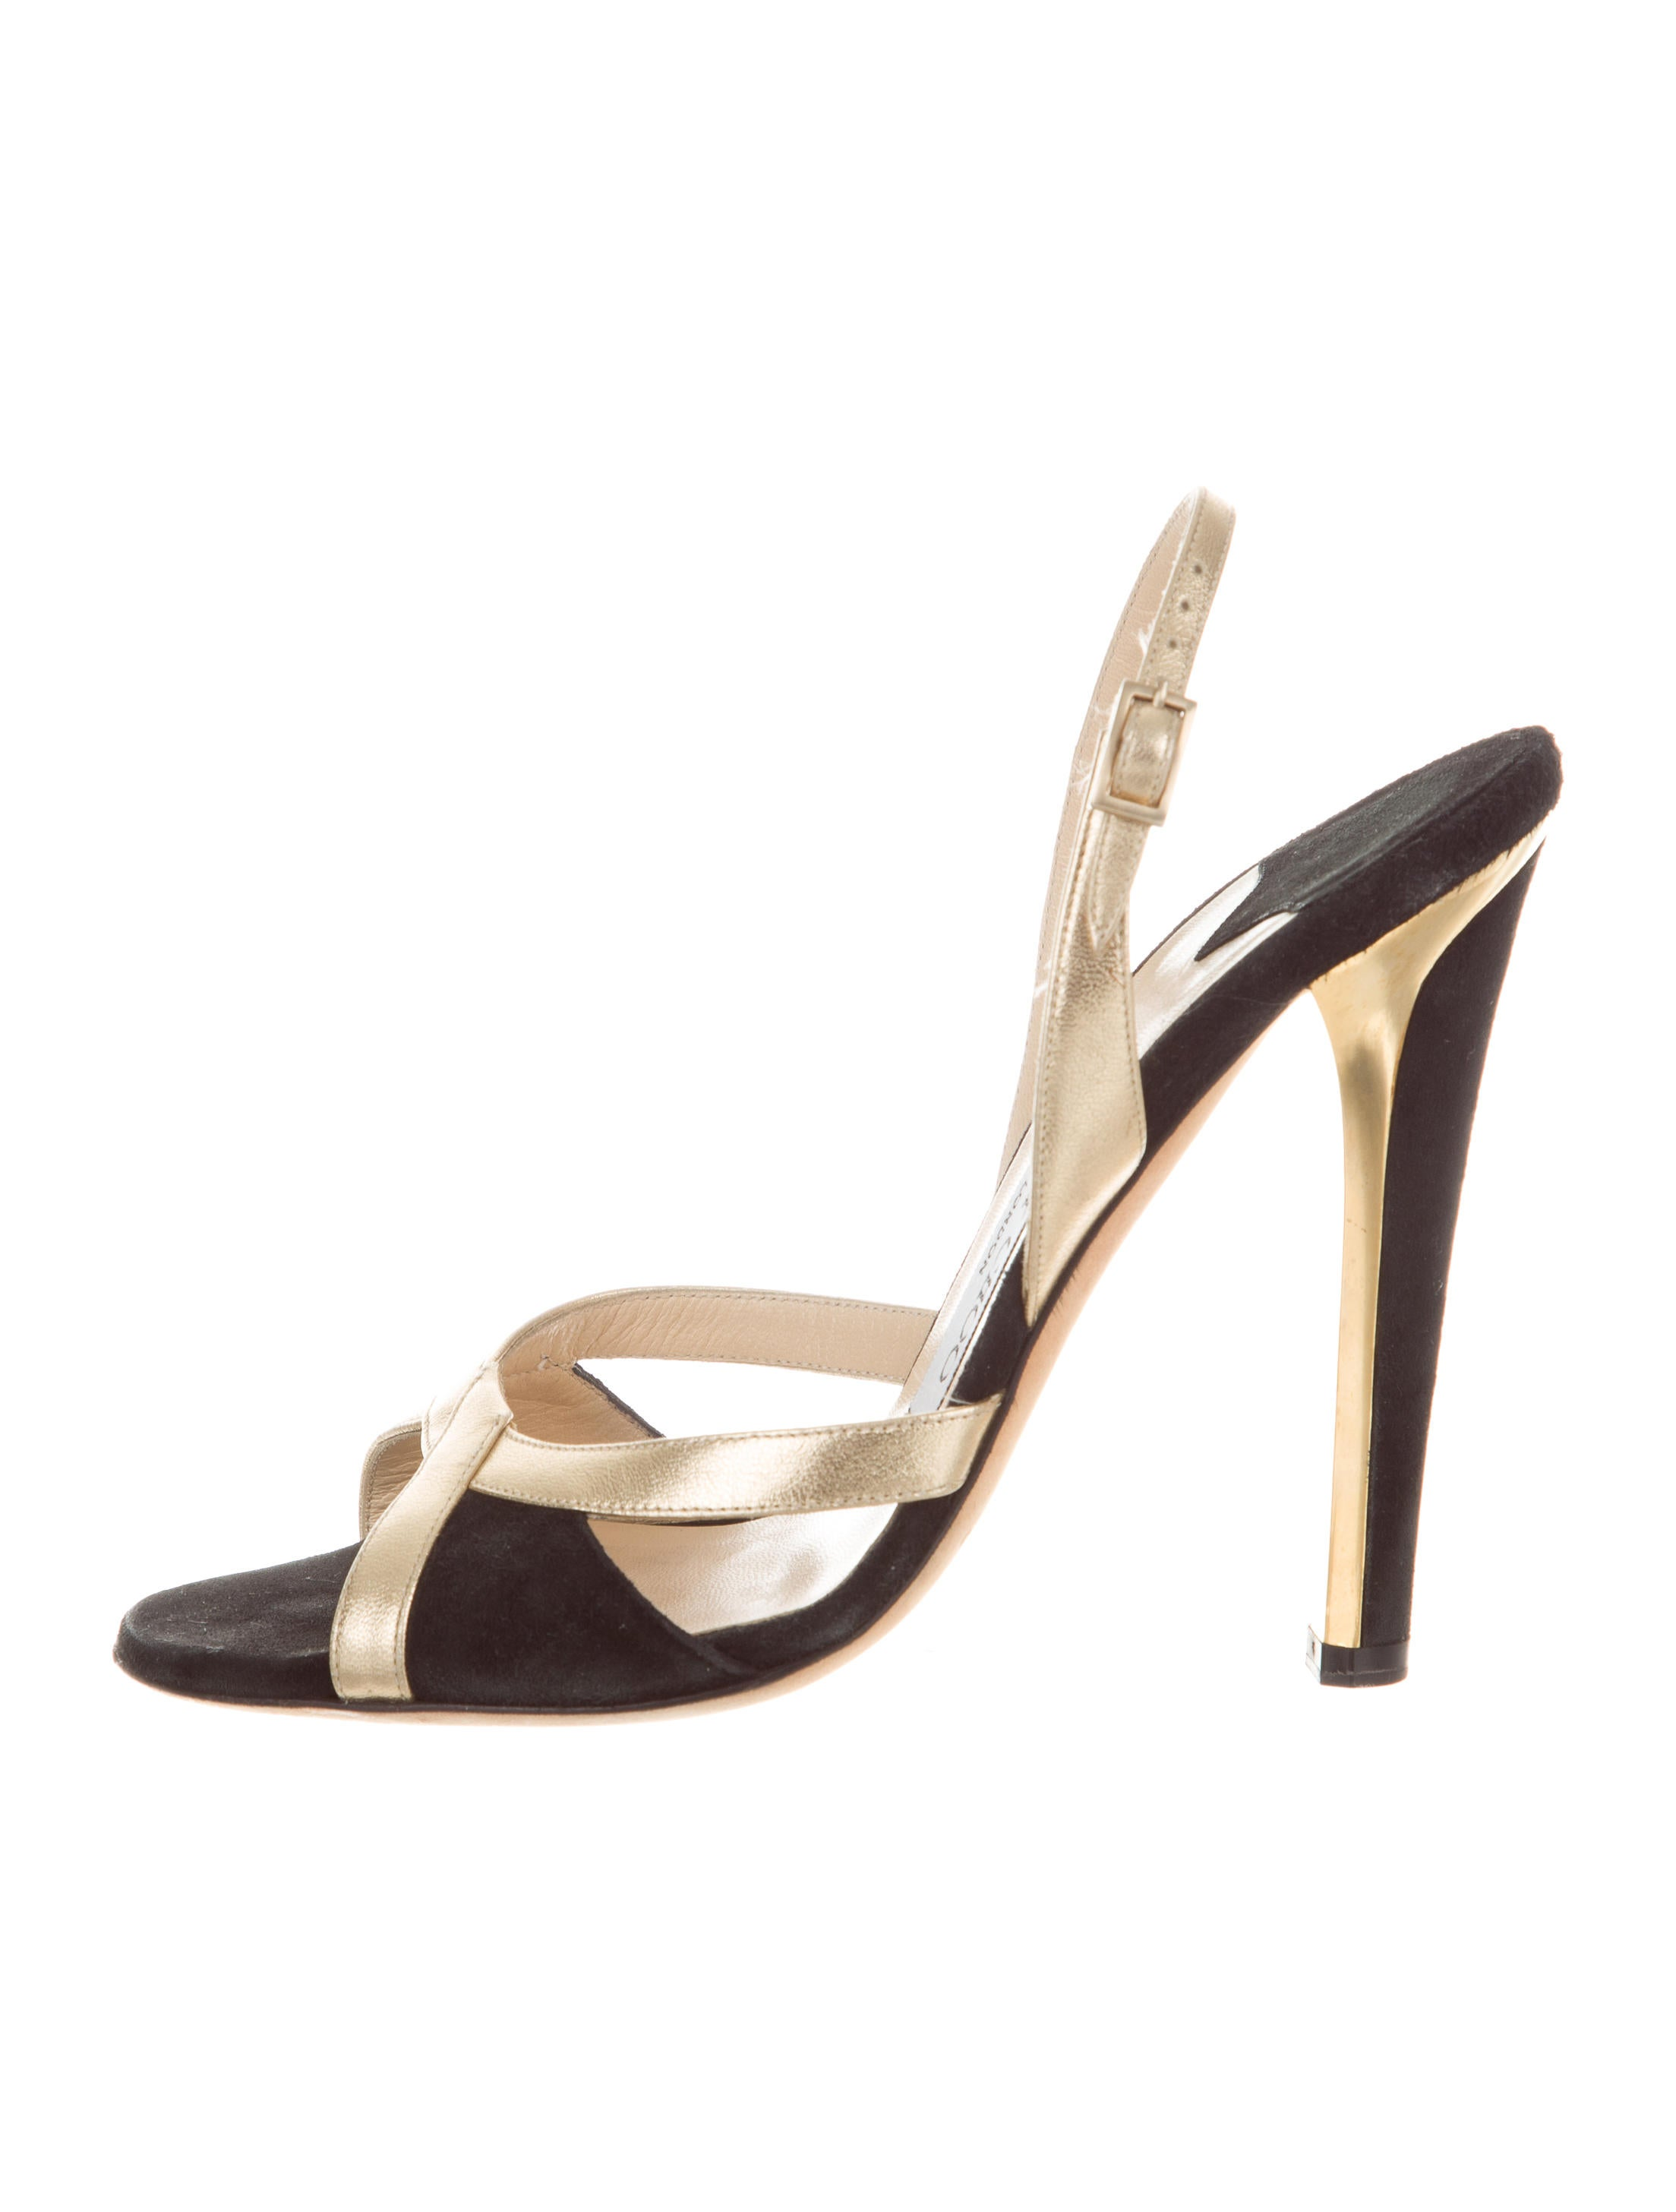 8644292777c21d Jimmy Choo Metallic Slingback Sandals - Shoes - JIM79562